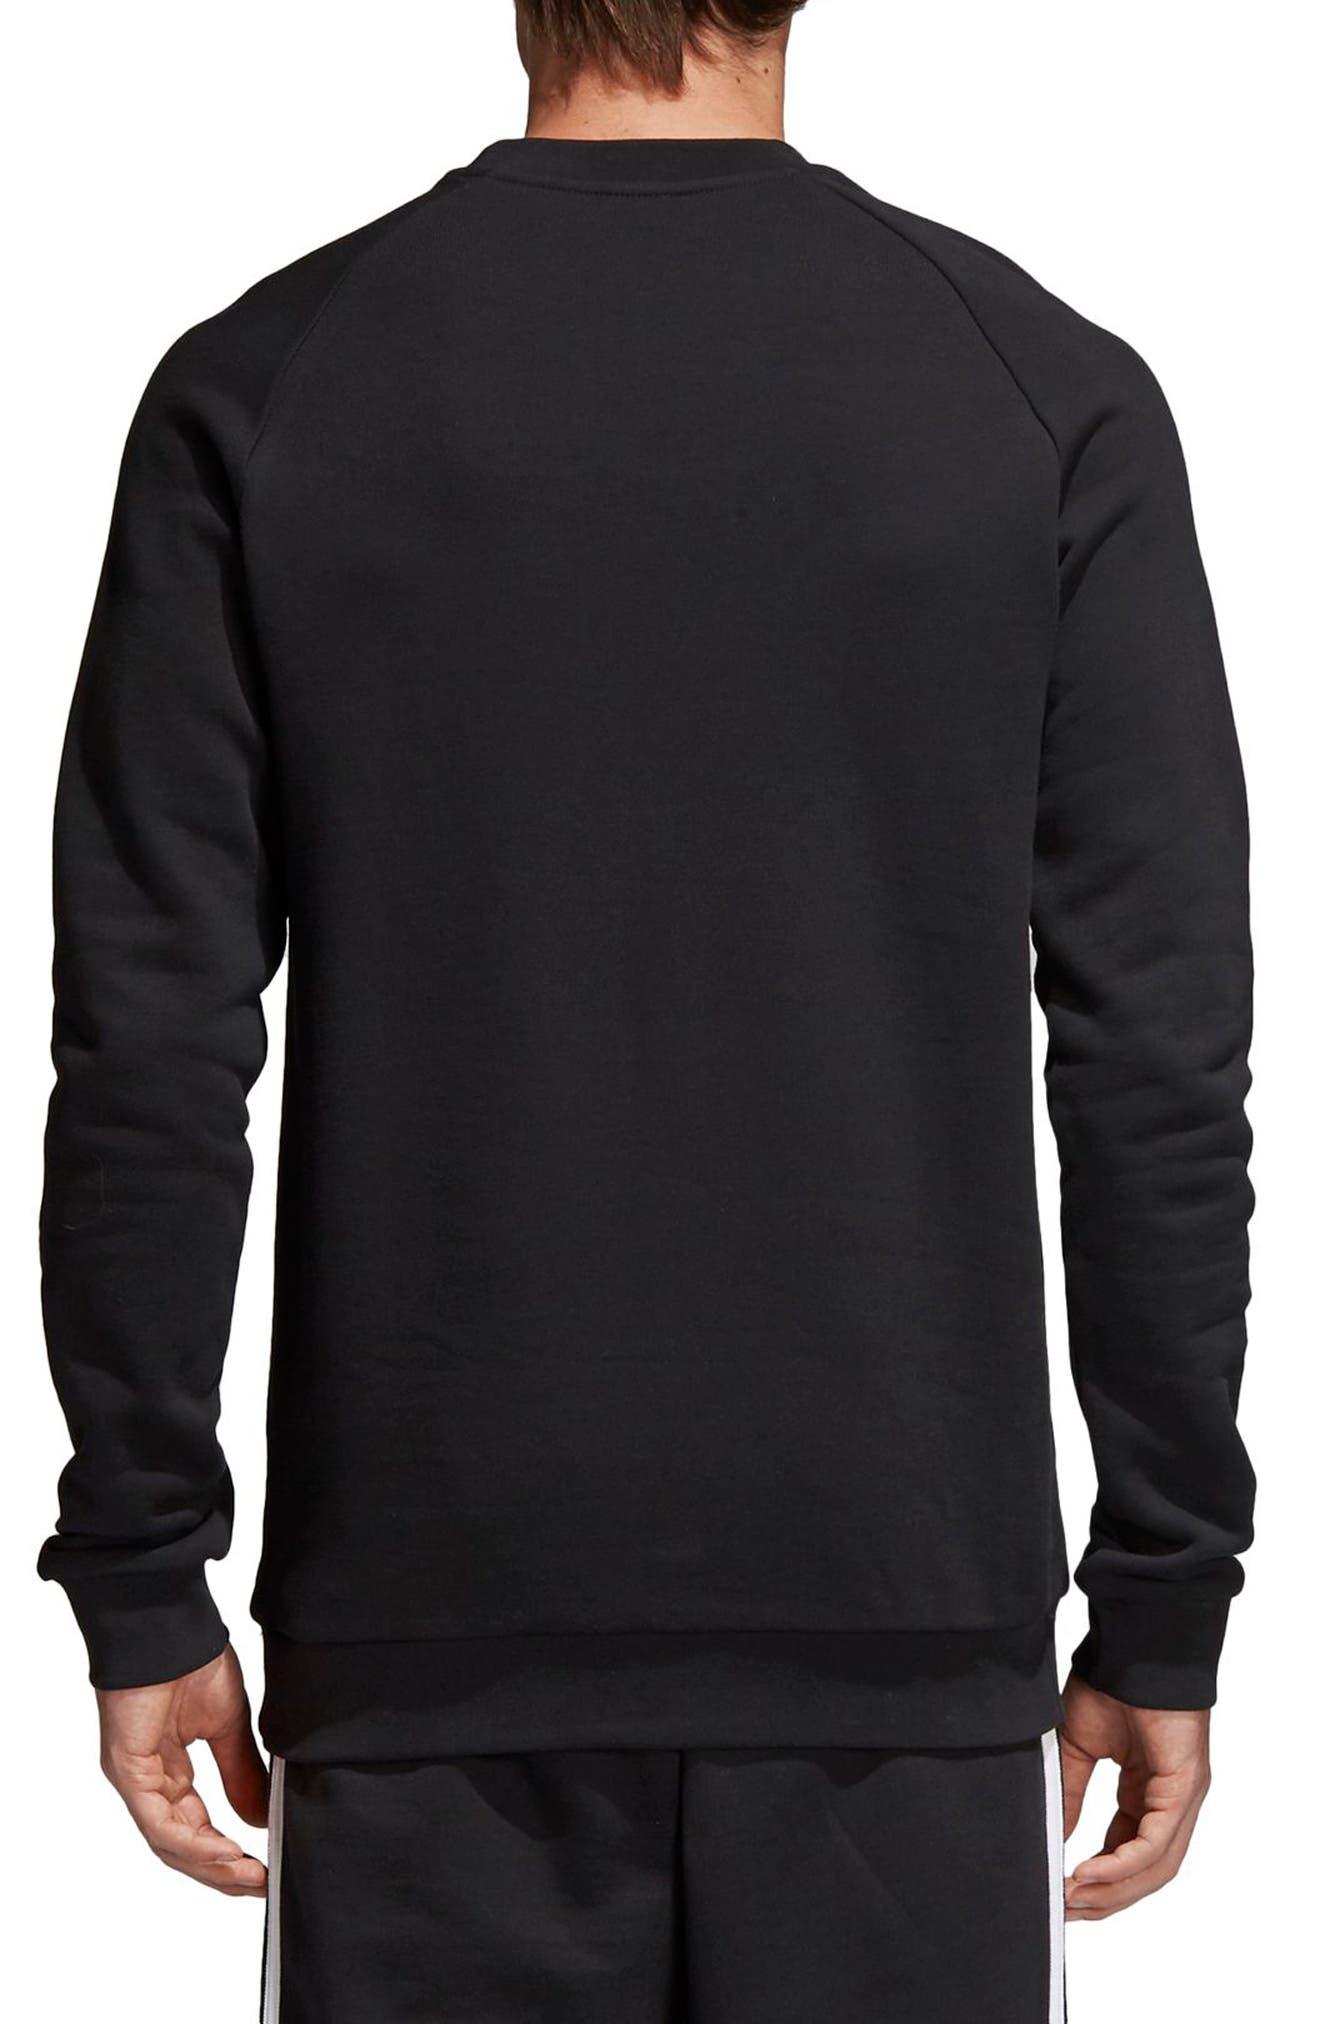 Trefoil Sweatshirt,                             Alternate thumbnail 2, color,                             BLACK